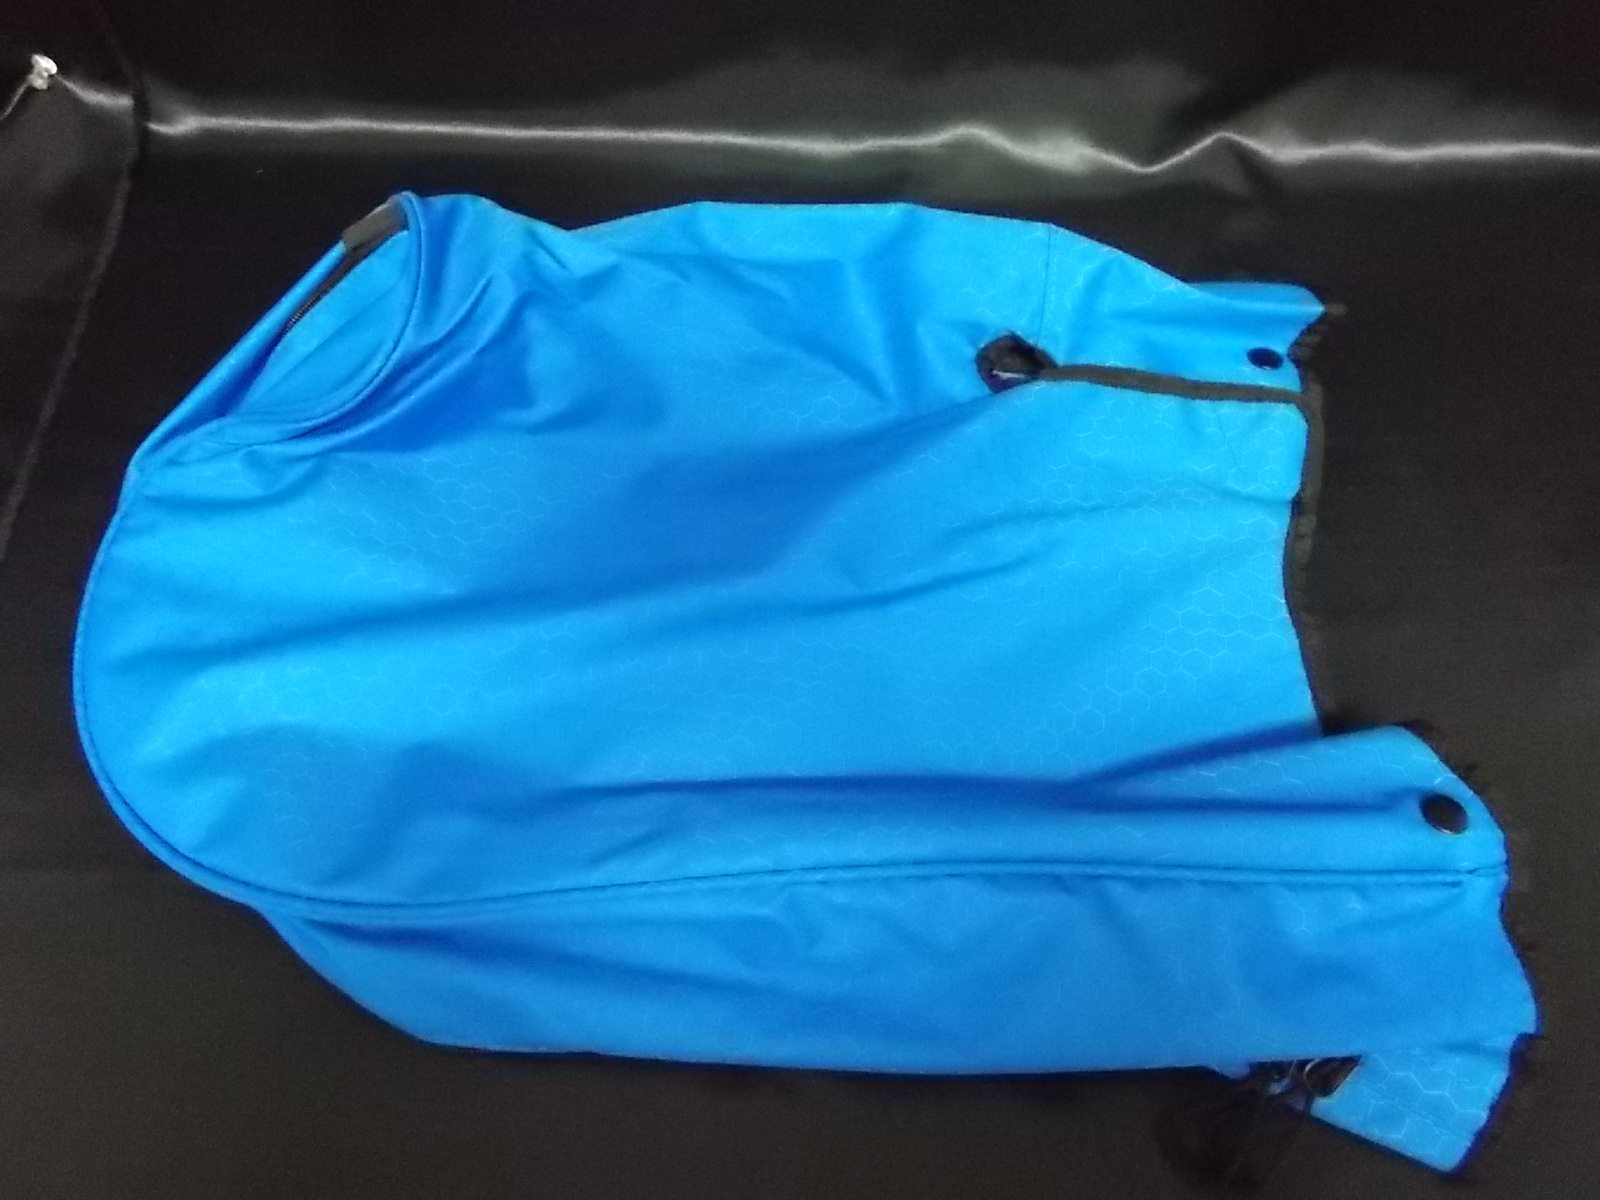 ScottyCameron Cart Bag with Headcovers set Blue/White スコッティキャメロン 2019 カートバッグ ヘッドカバー5点付 200本限定